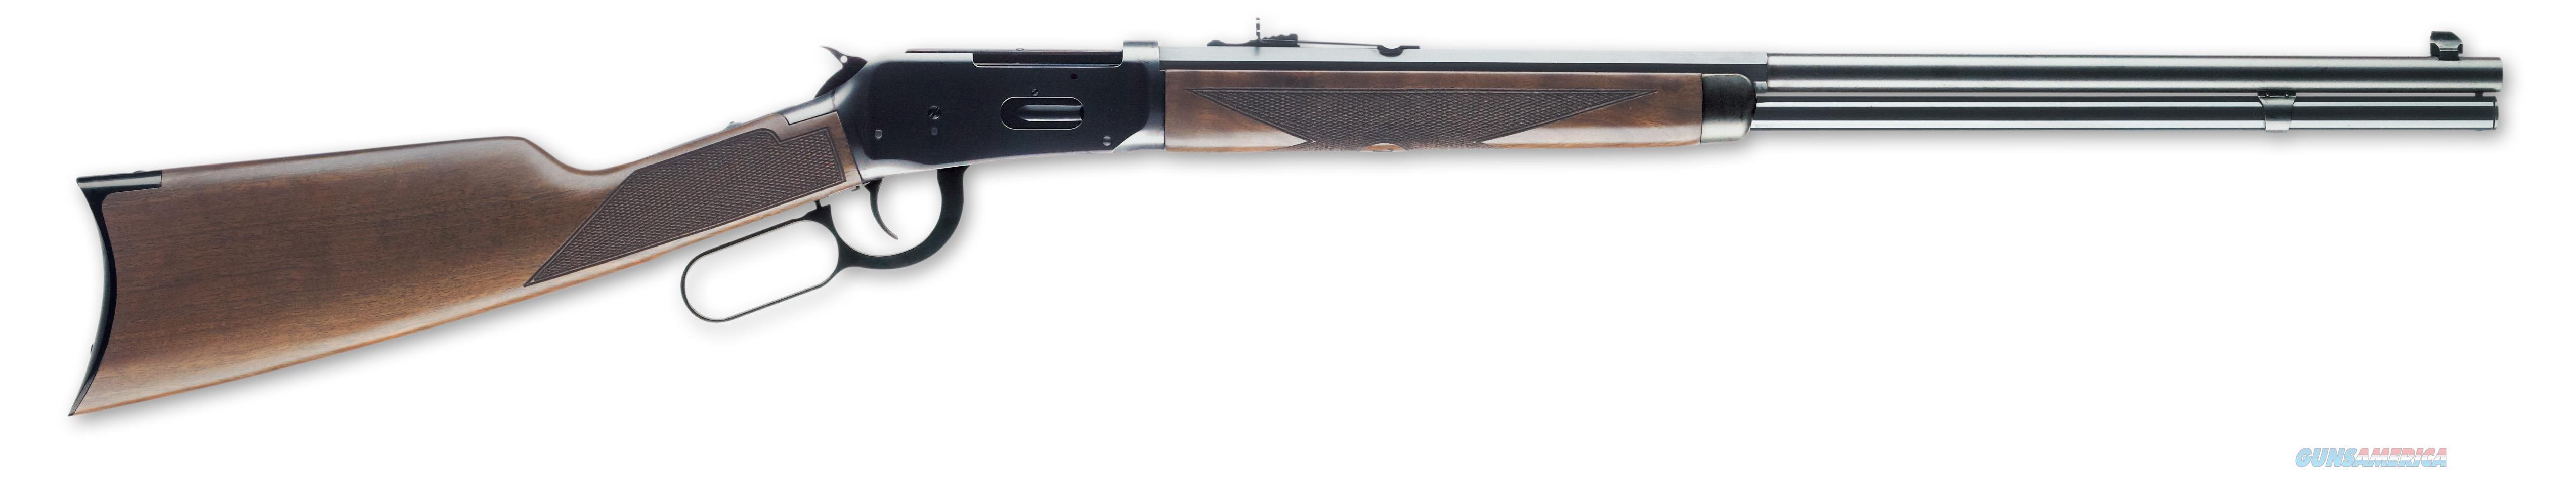 "Winchester Model 94 Sporter .38-55 Win 24"" 534178117   Guns > Rifles > Winchester Rifles - Modern Lever > Model 94 > Post-64"